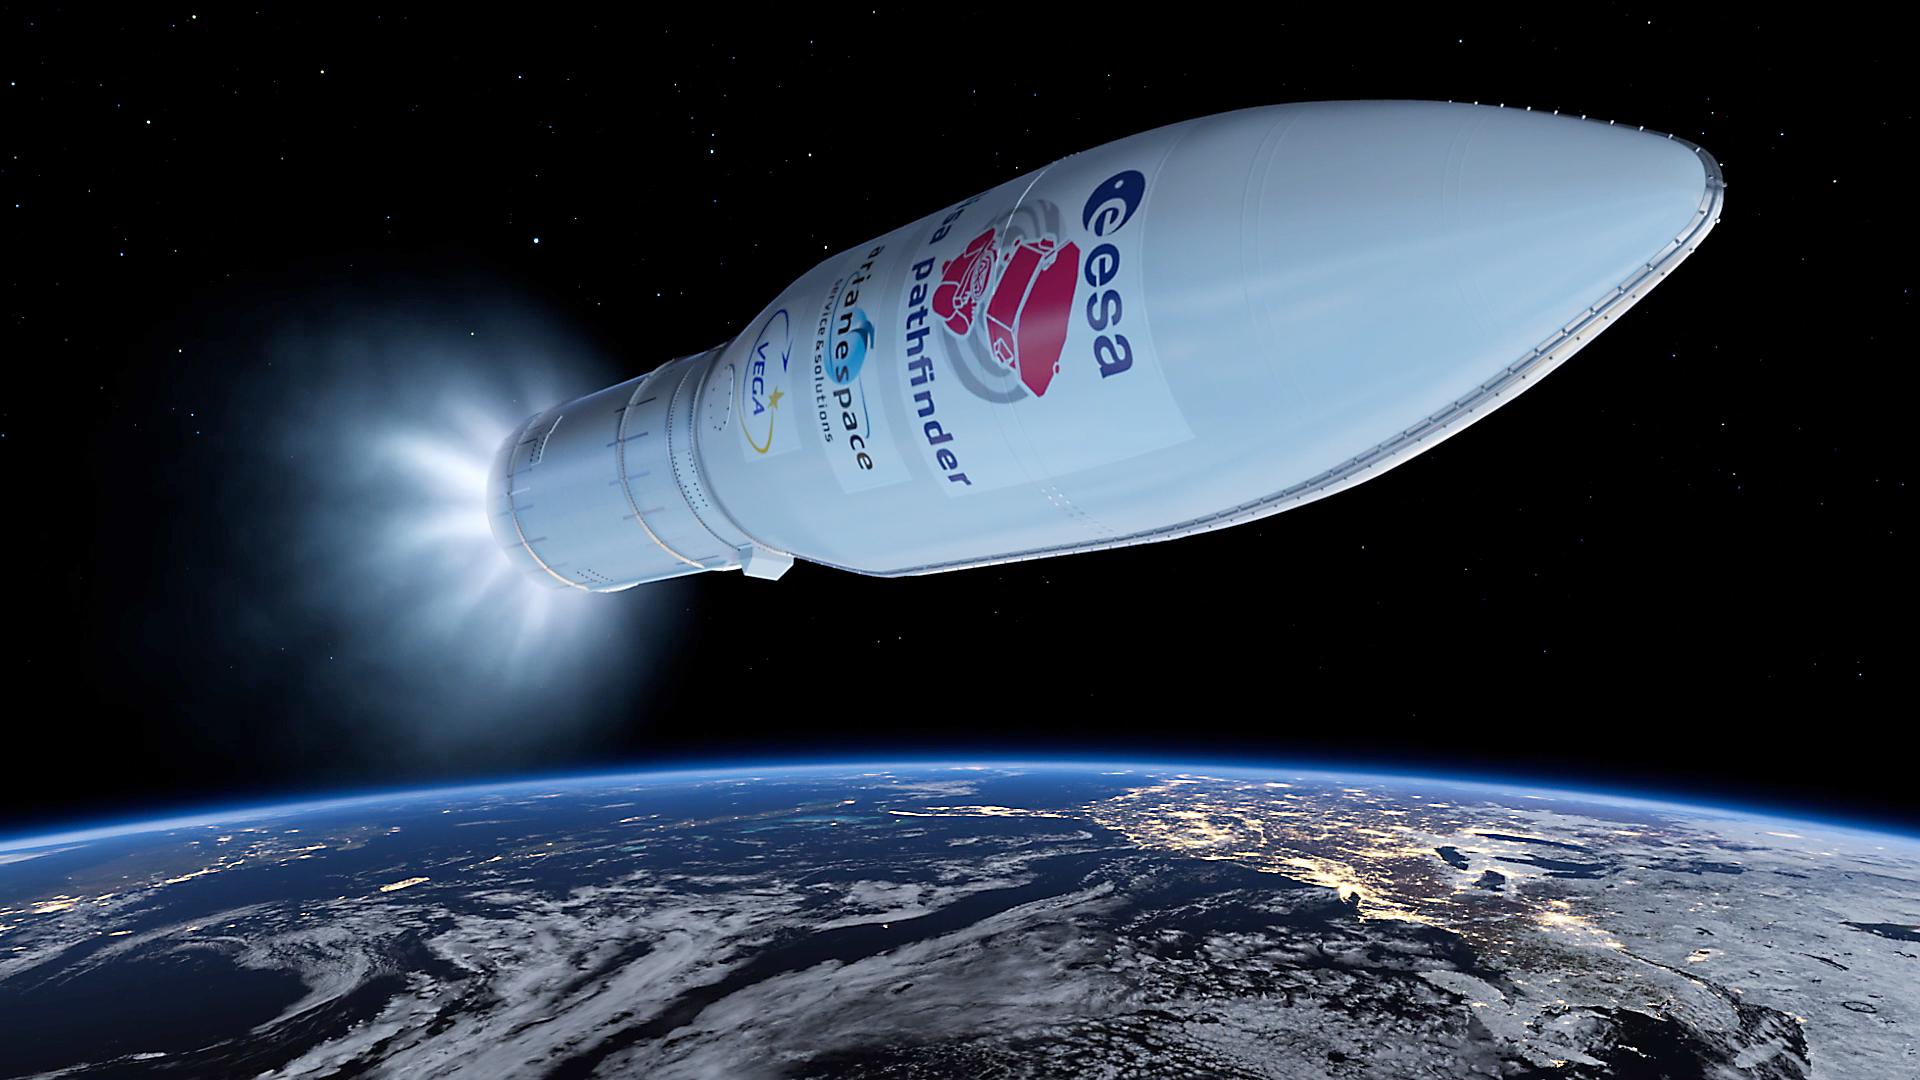 esa science amp technology lisa pathfinder launch